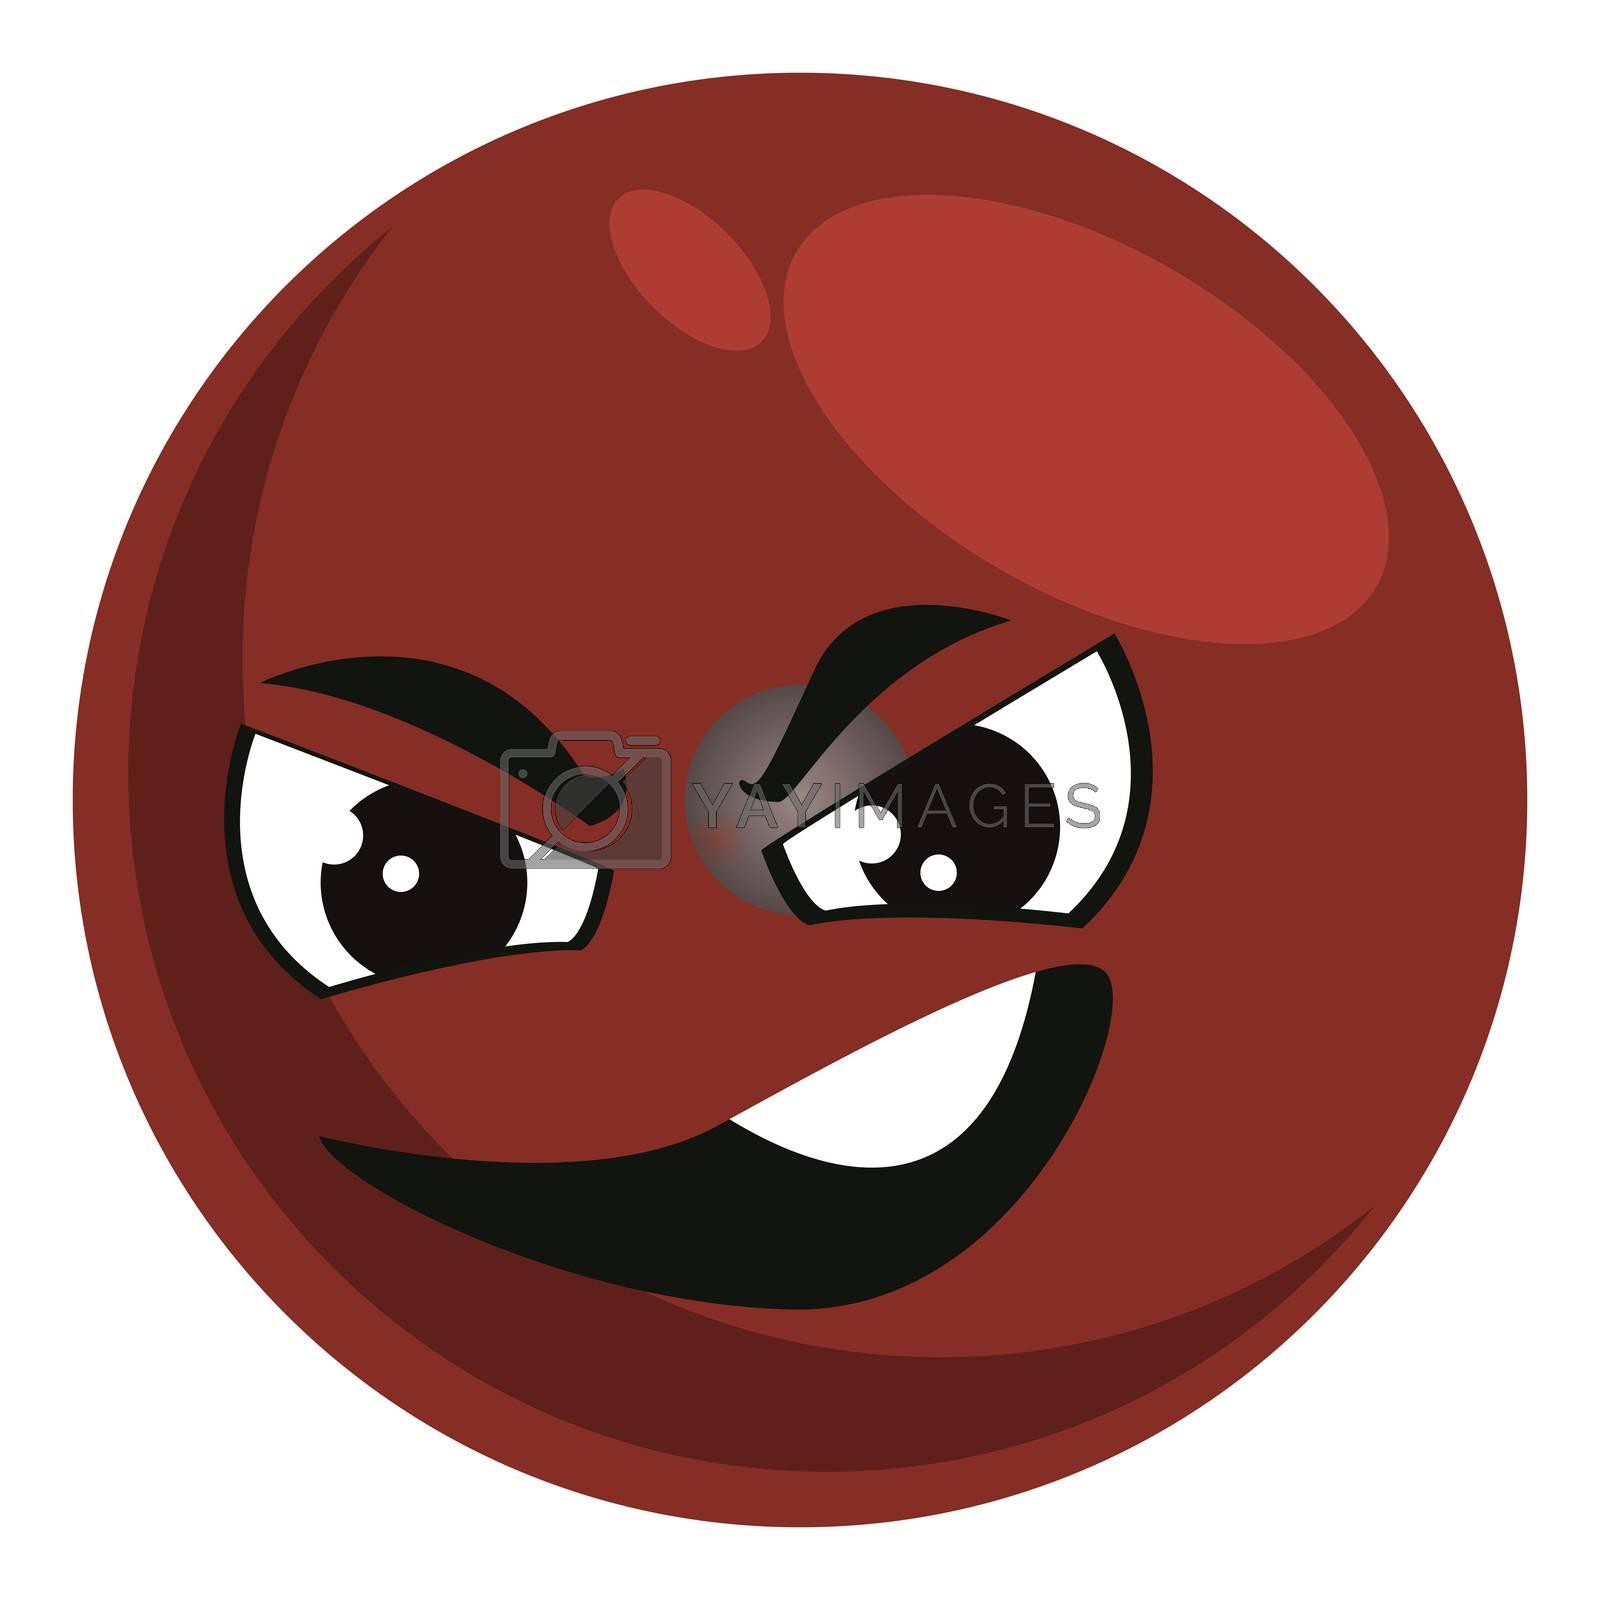 Evil emoji, illustration, vector on white background